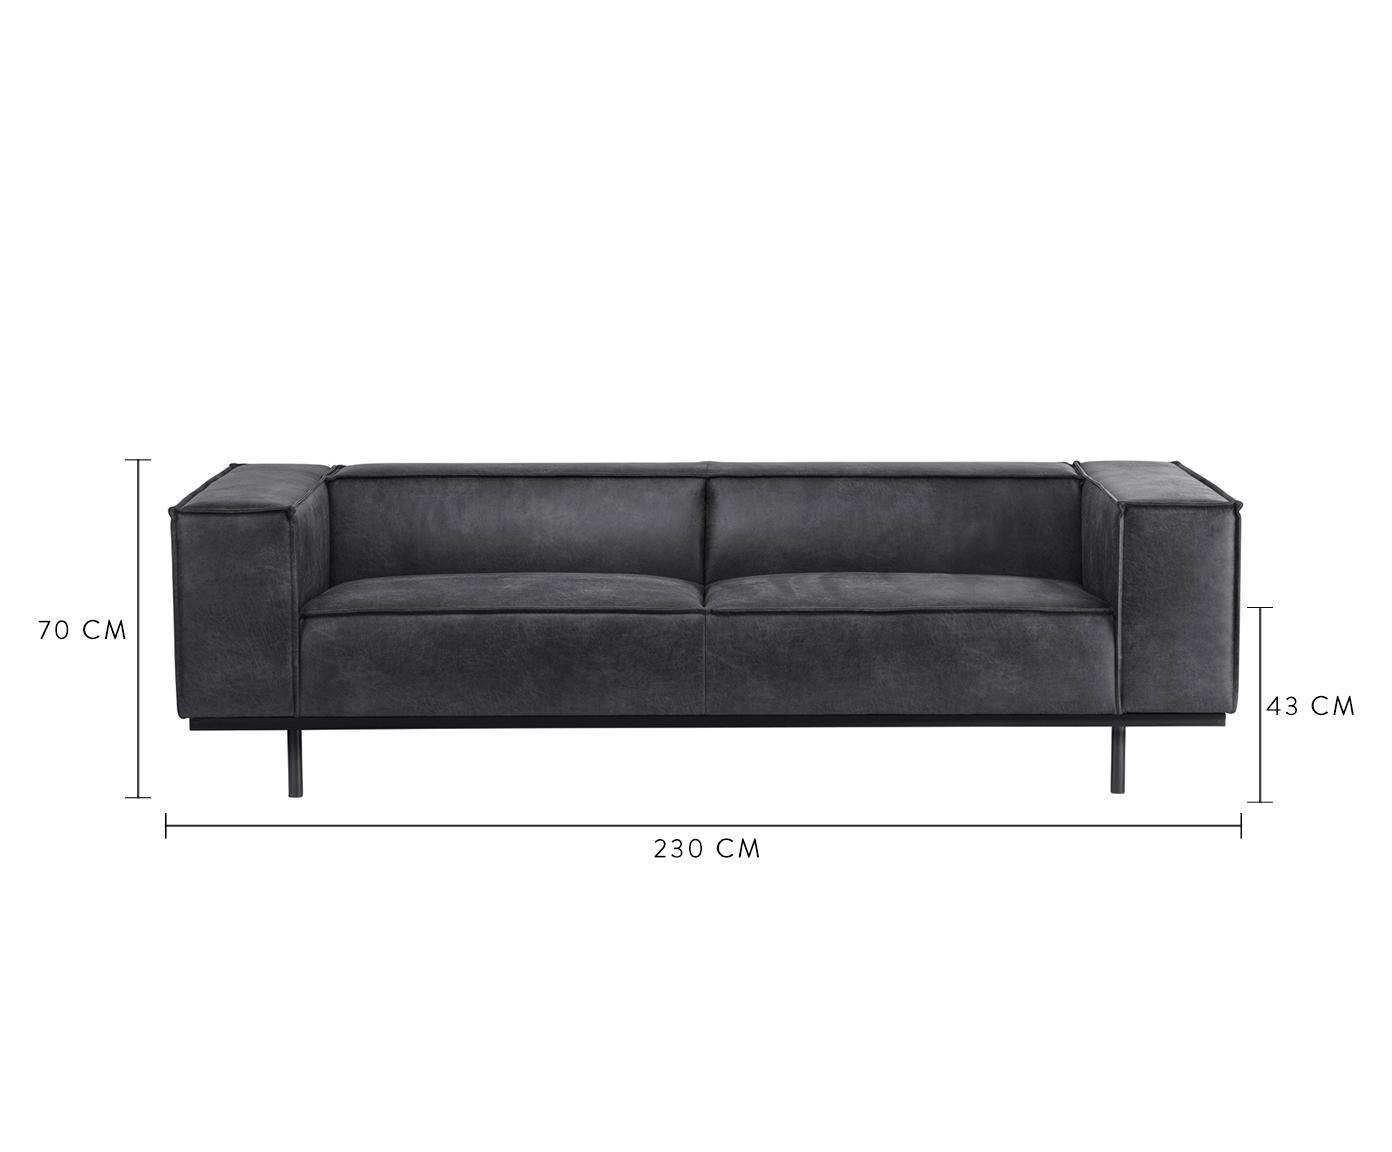 Sofa ze skóry Abigail (3-osobowa), Tapicerka: skóra naturalna (70% skór, Nogi: stal lakierowana, Ciemno szara skóra, S 230 x G 95 cm